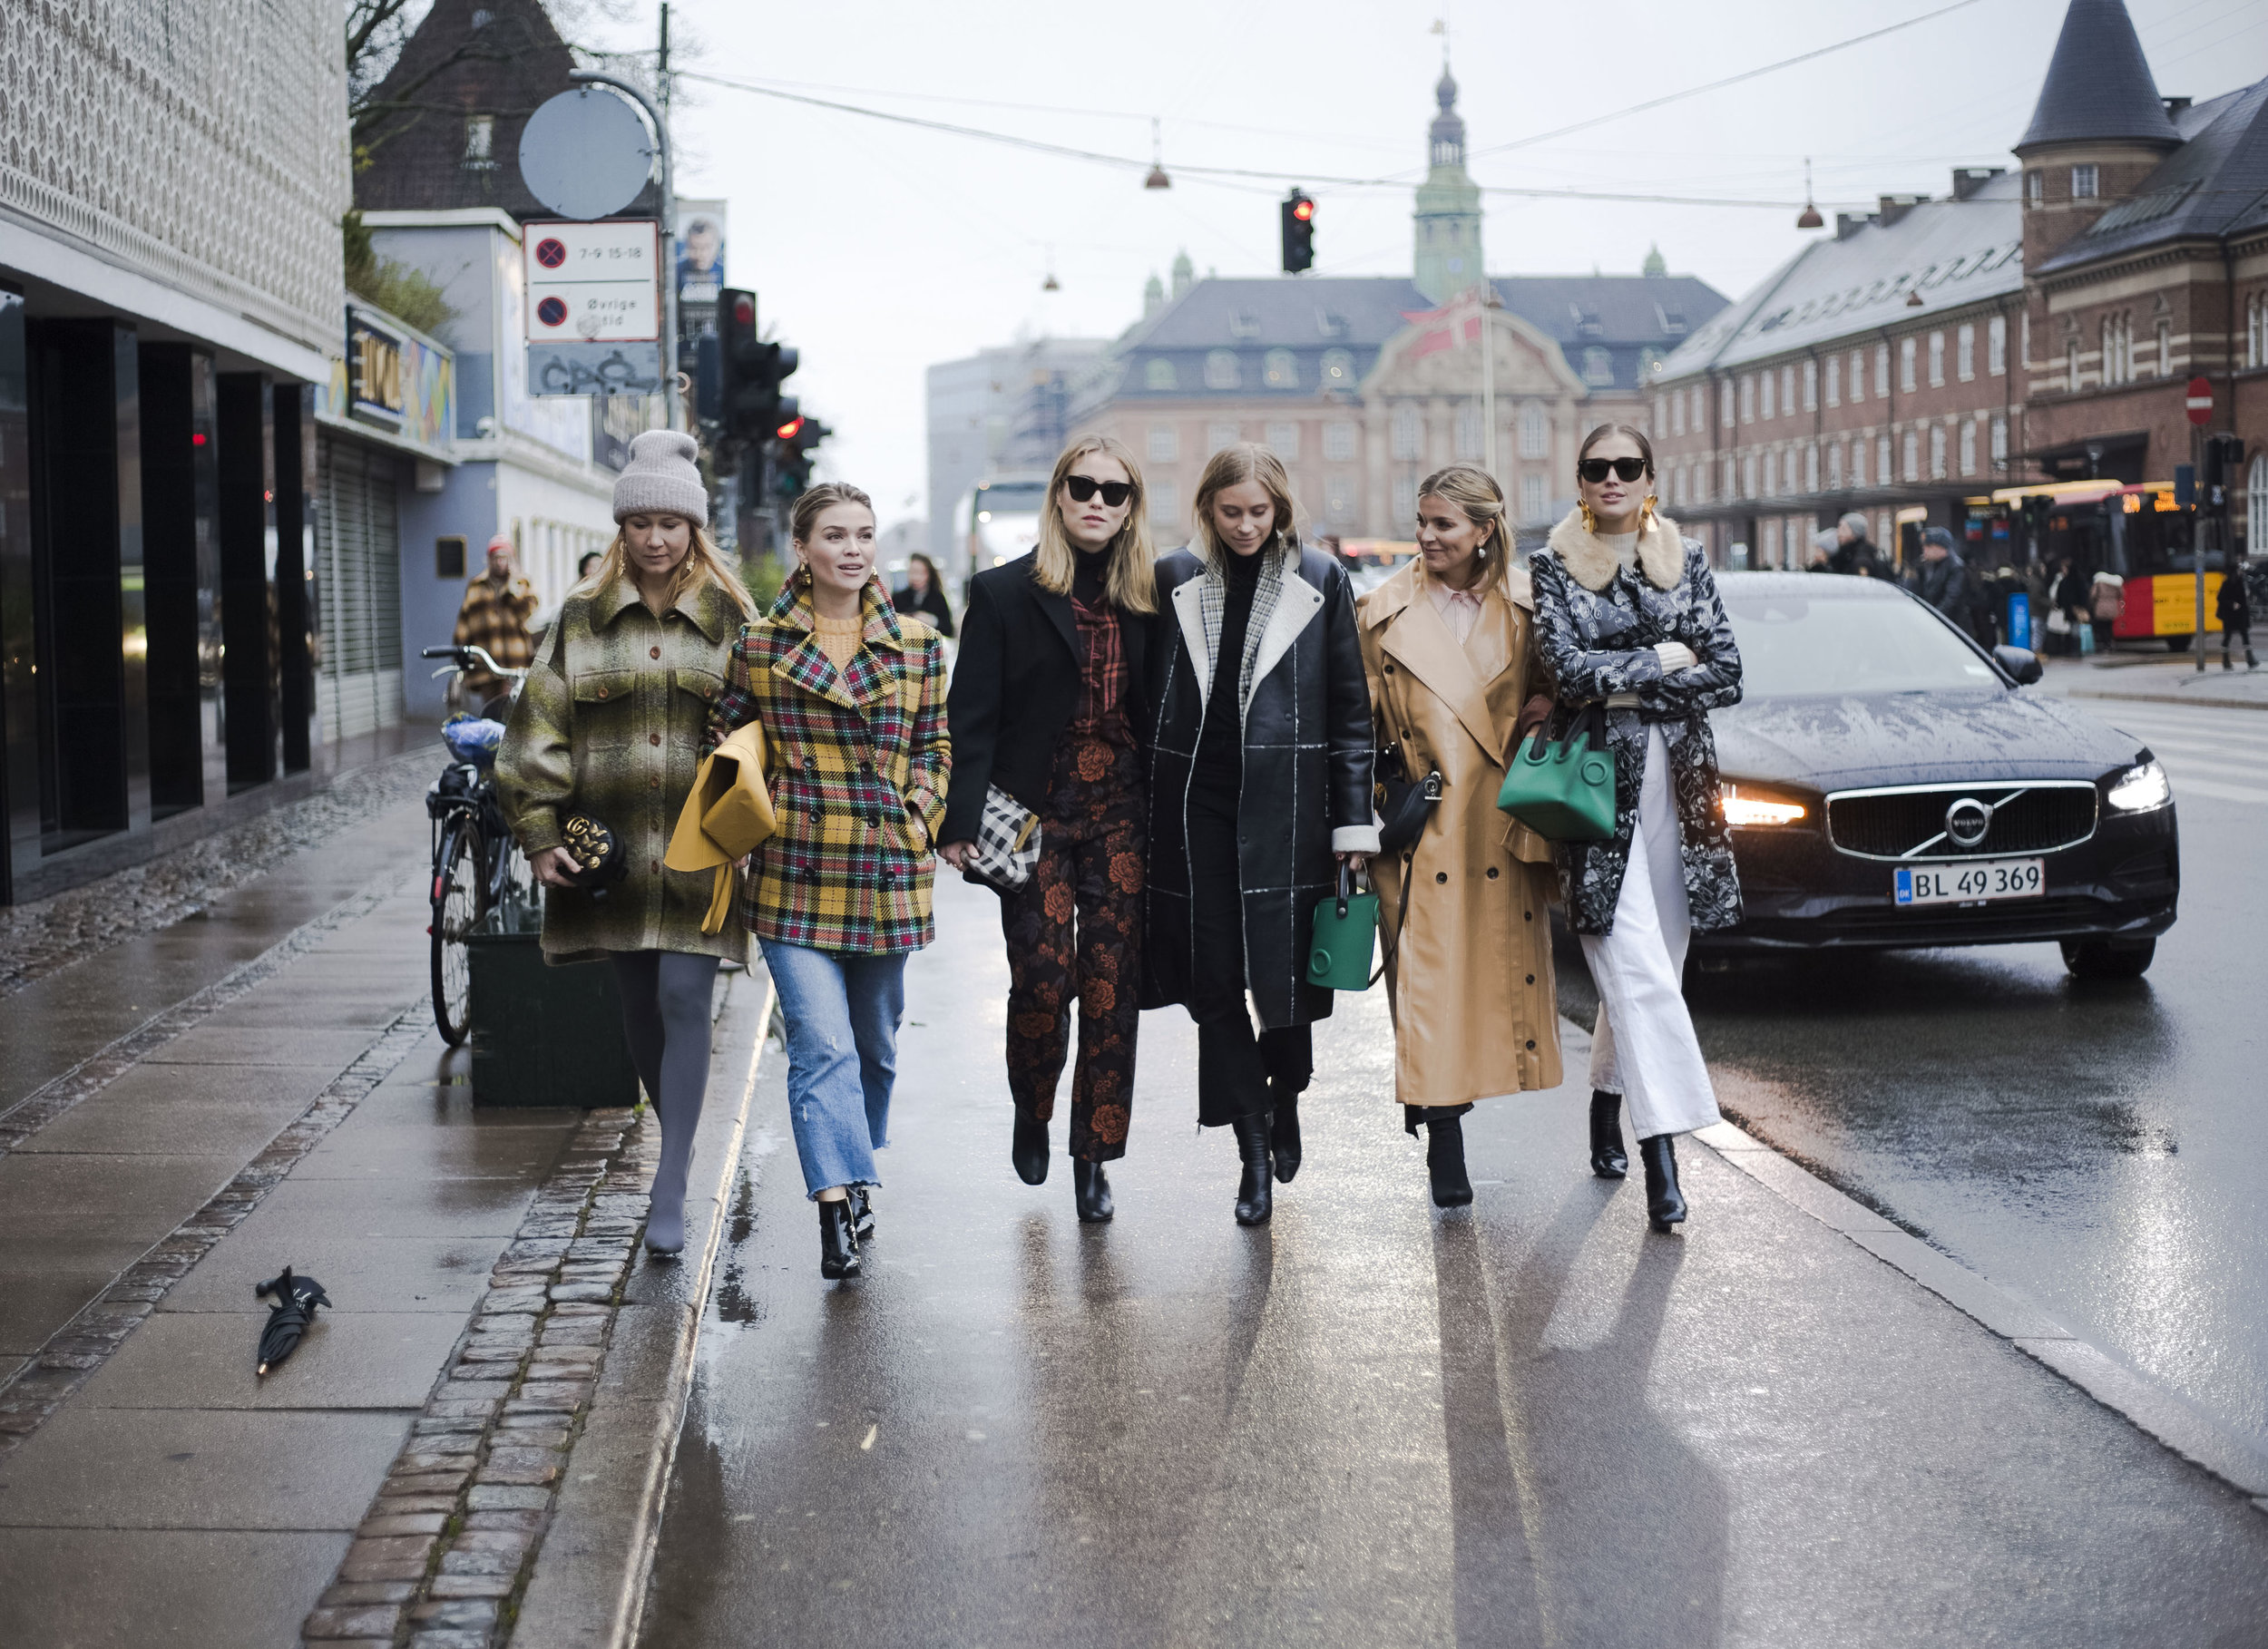 fashion-queens-fashionweek-street-style-streetstyle-thestreetland-fashion-janka-polliani-darja-barannik-tine-andrea-annabel-rosendahl-gine-margrethe-best-style.jpg